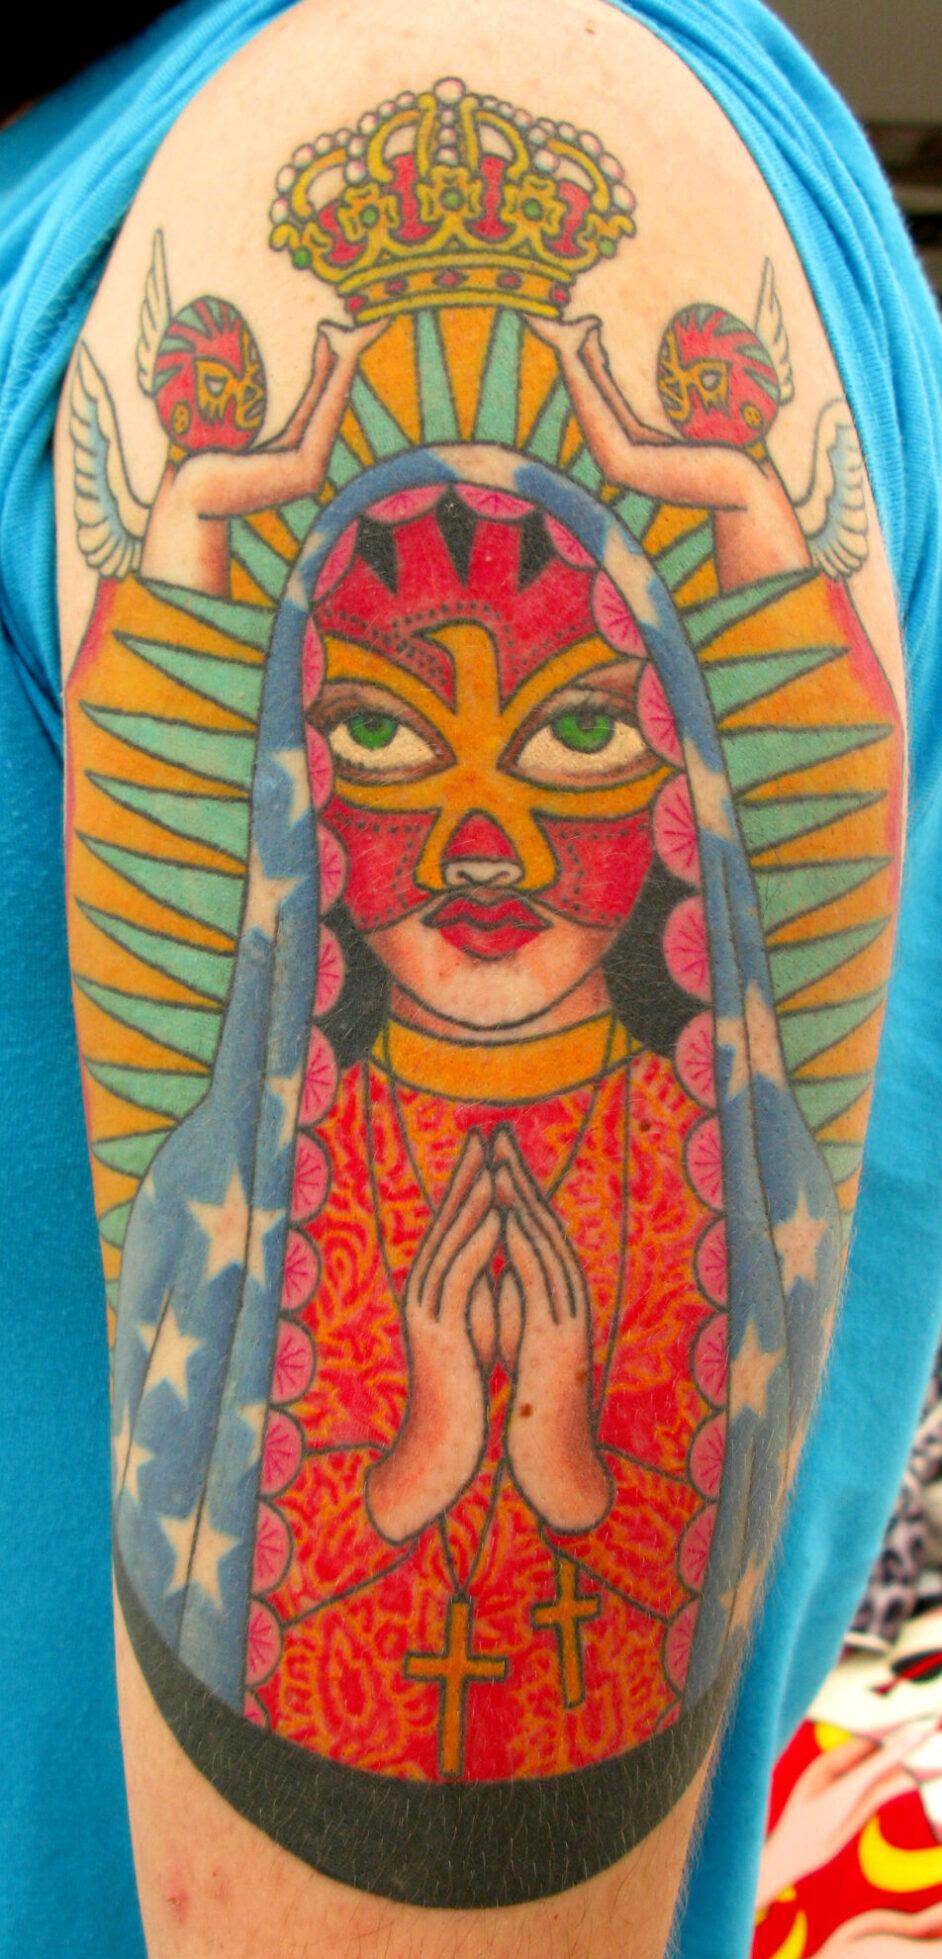 Tattoo by Sunny Buick